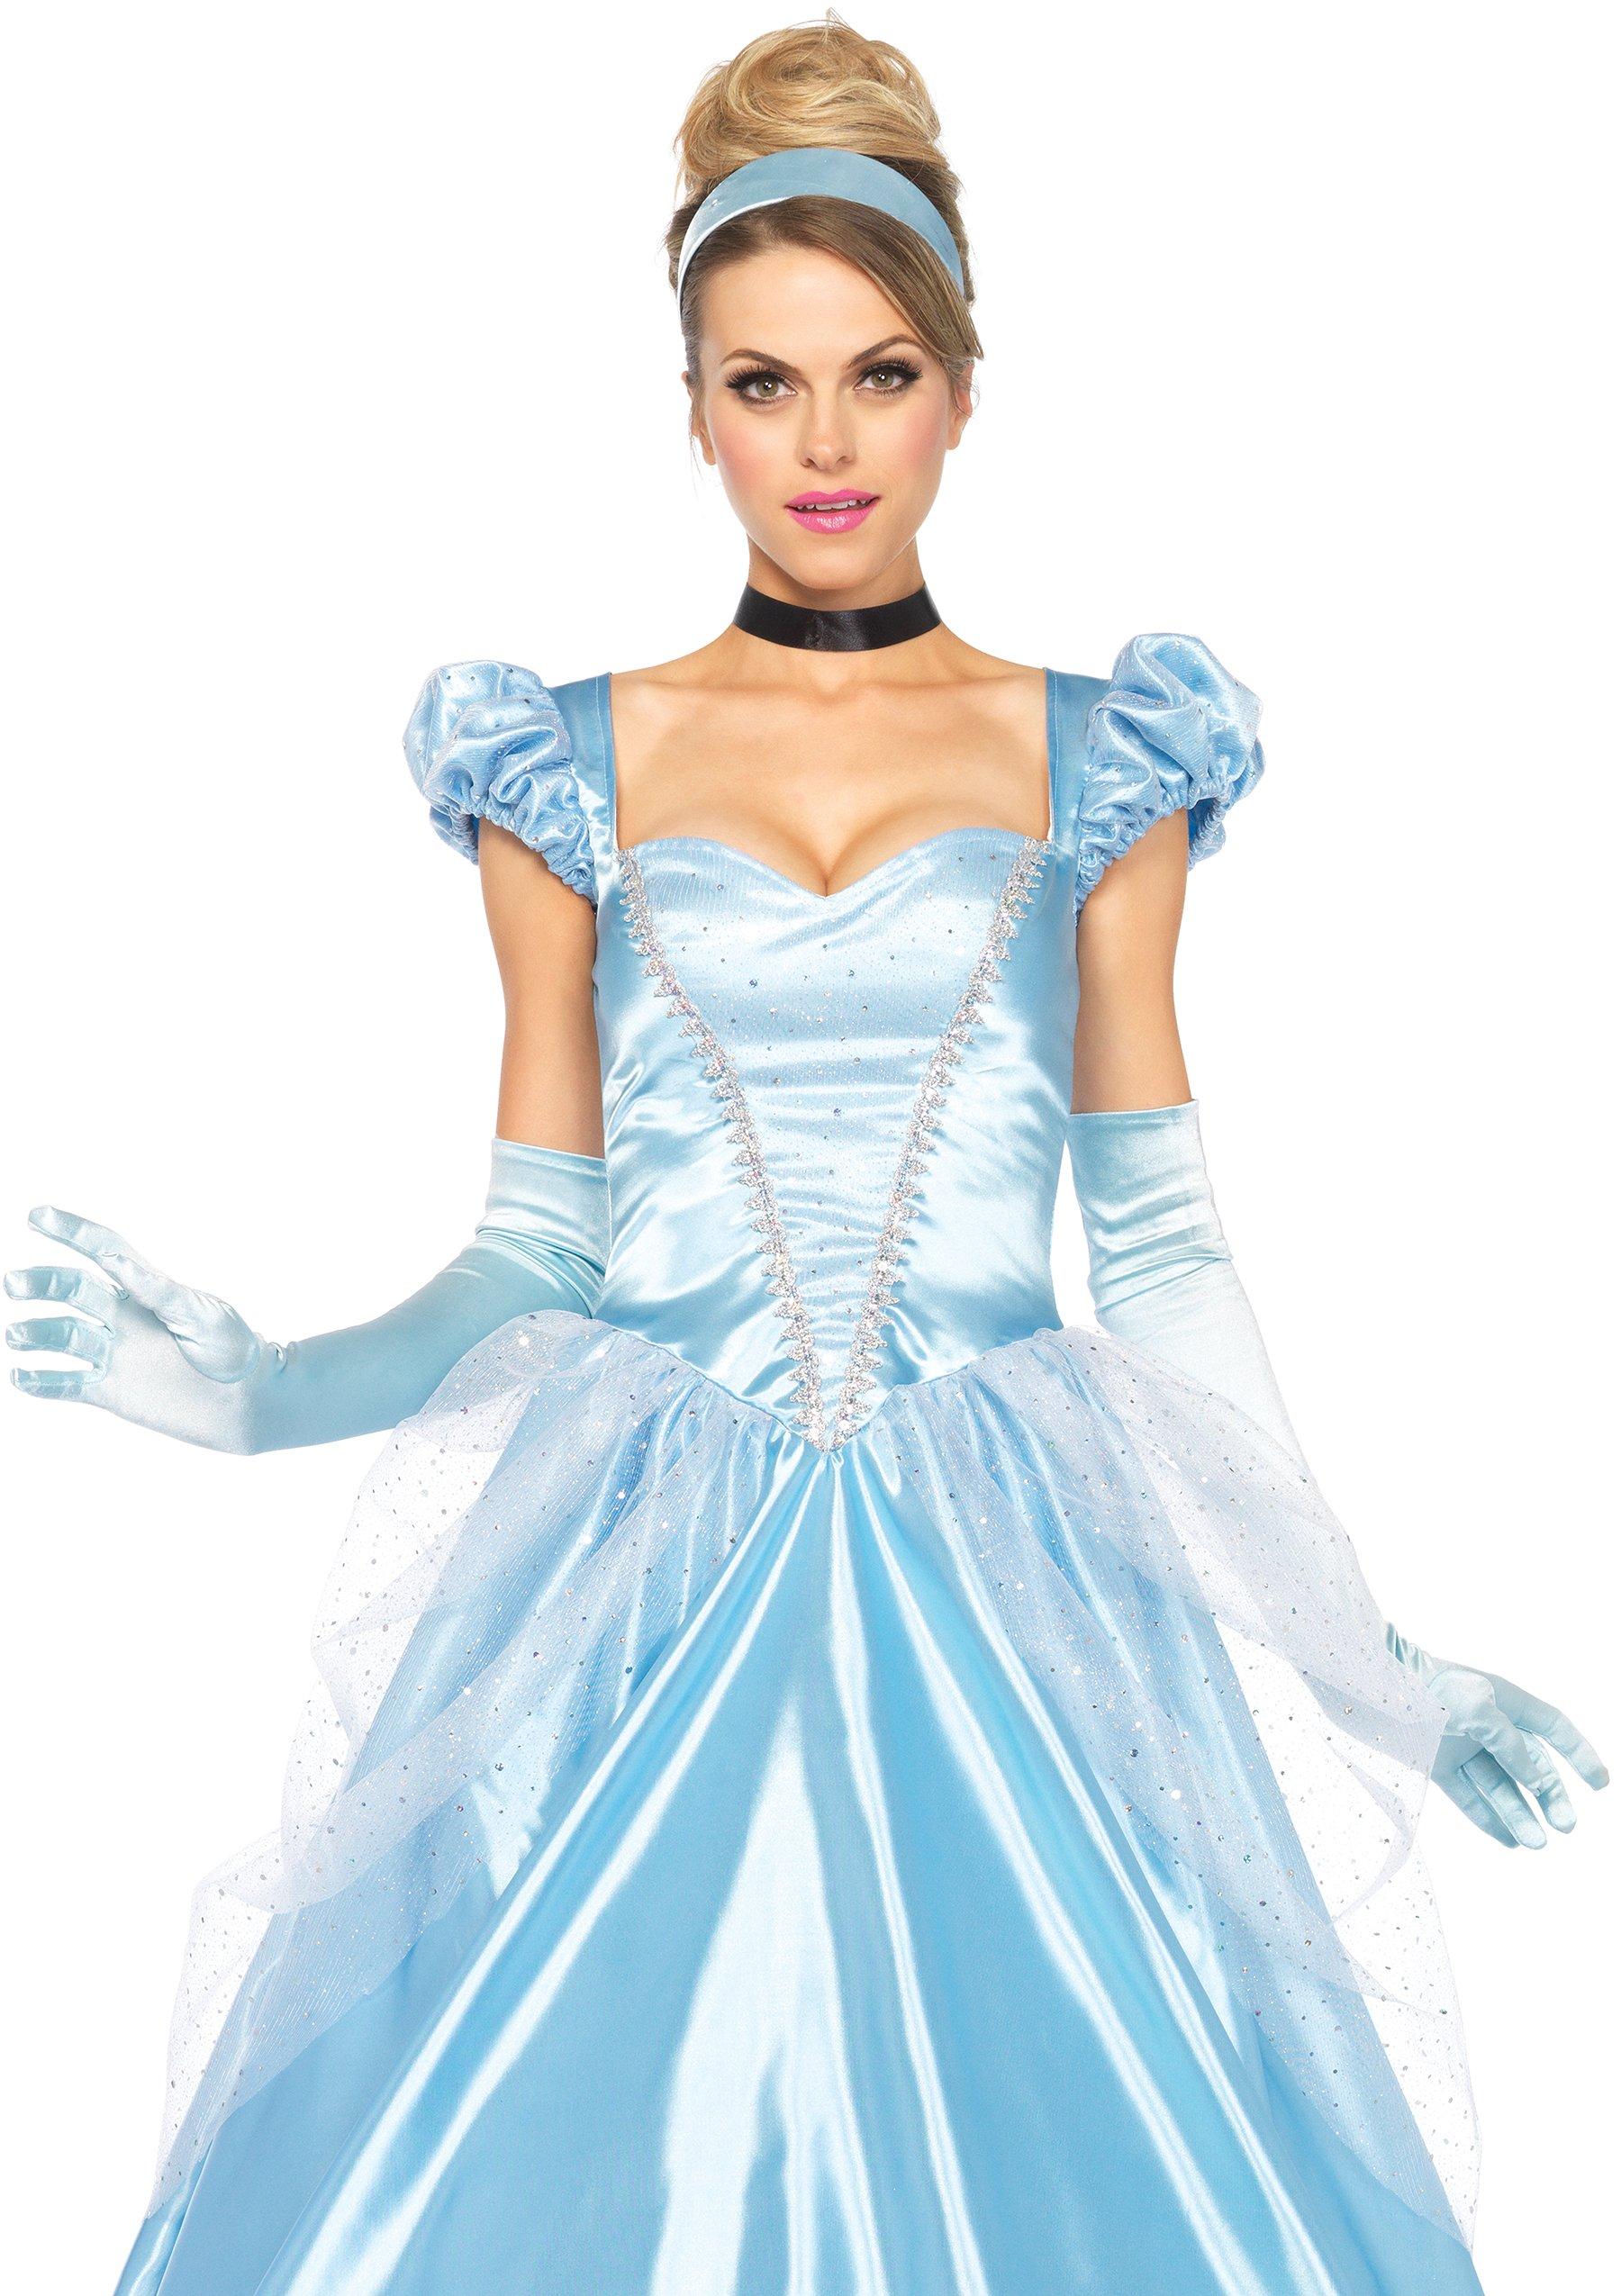 Leg Avenue Disney 3Pc. Classic Cinderella Costume, Blue, Large